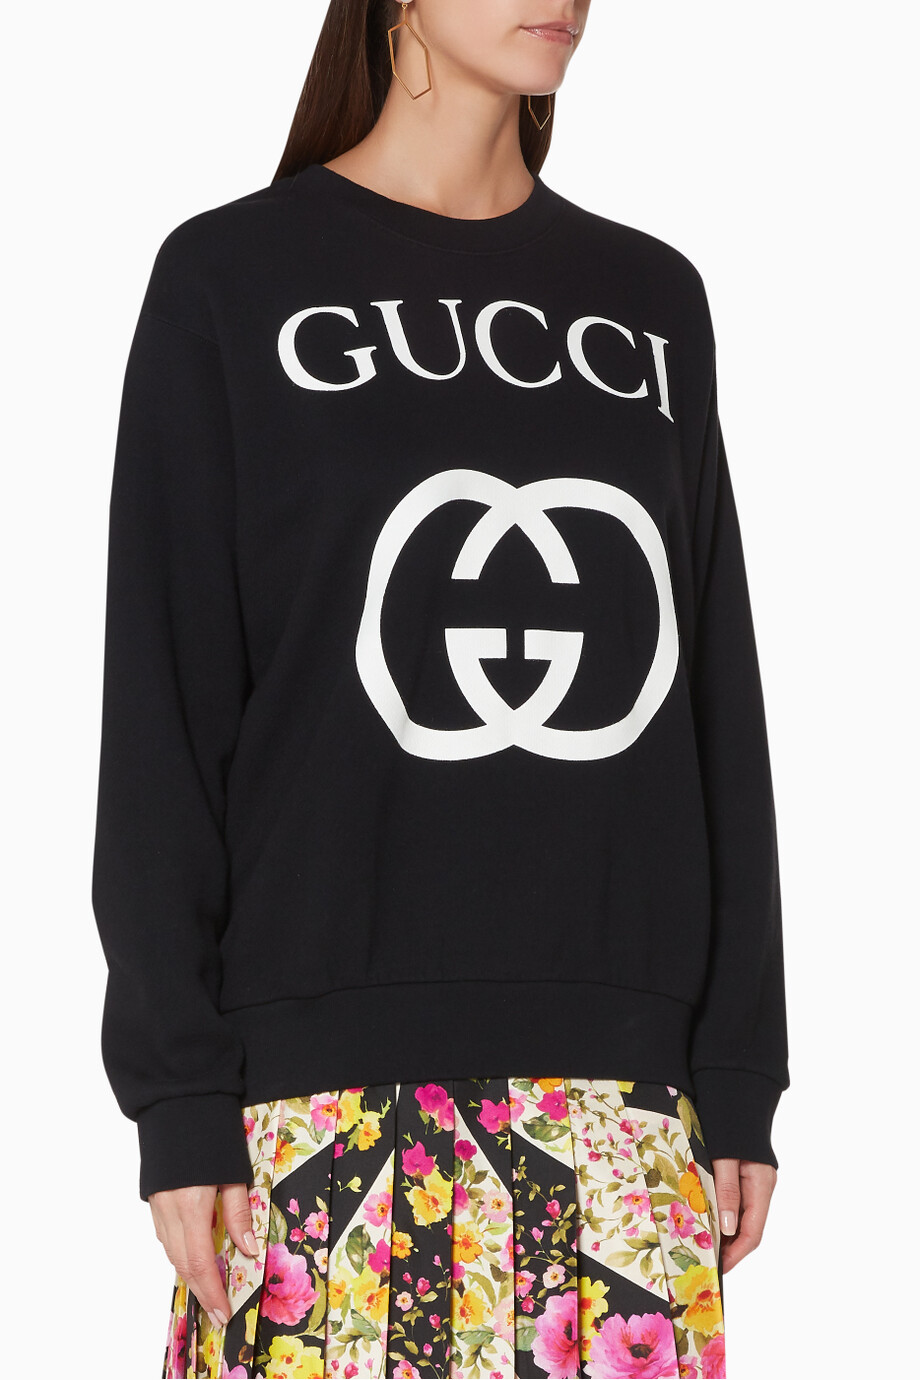 9f62f40a2da Shop Gucci White Black Interlocking G Sweatshirt for Women